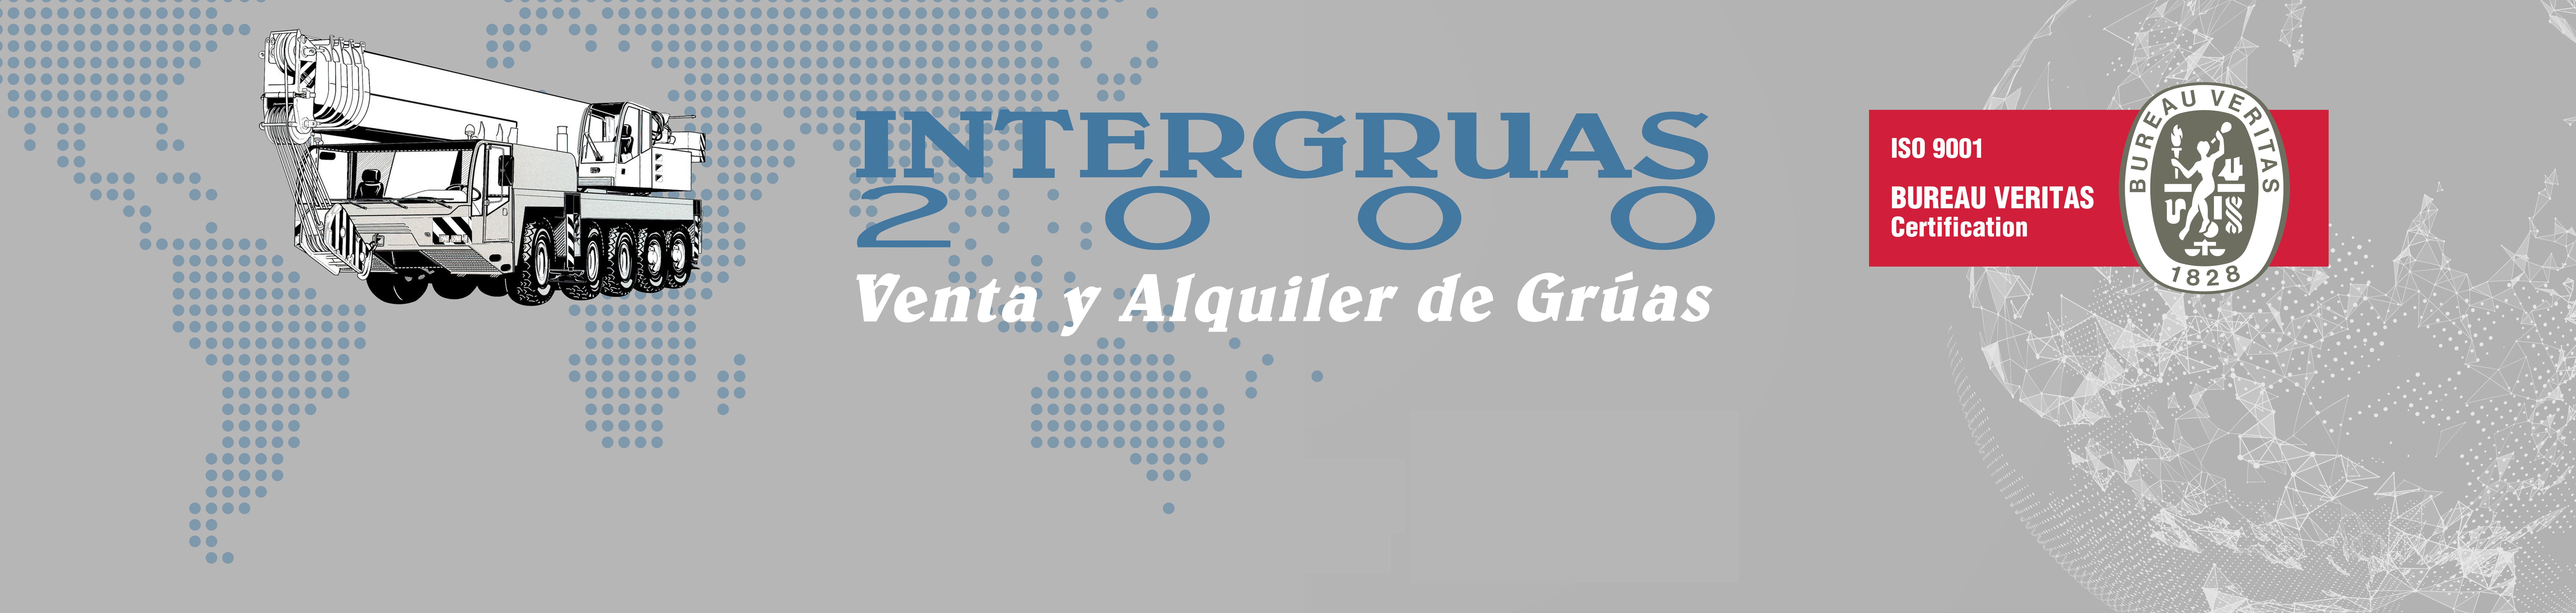 intergruas2000